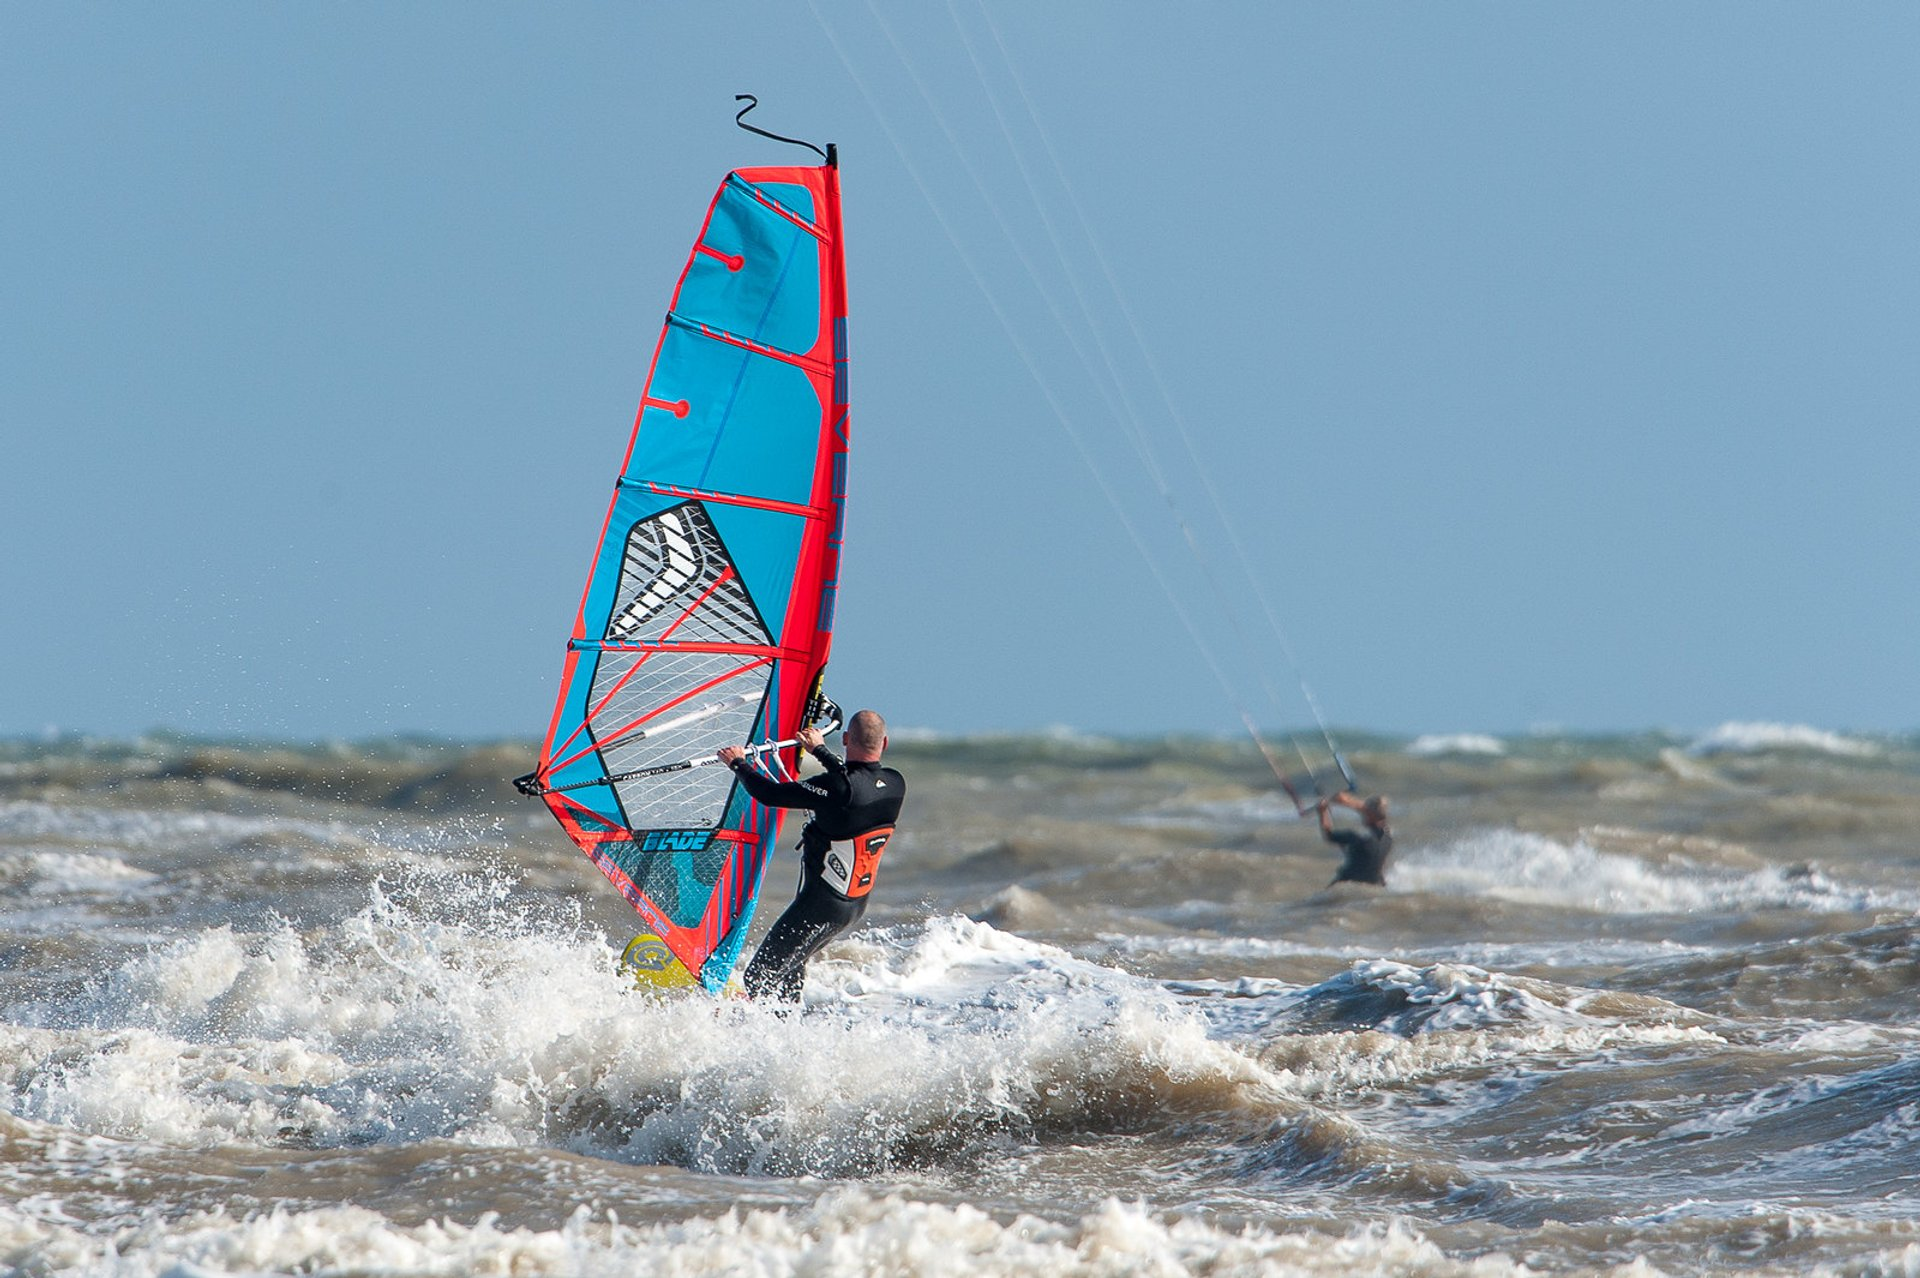 Kitesurfing & Windsurfing in London 2020 - Best Time